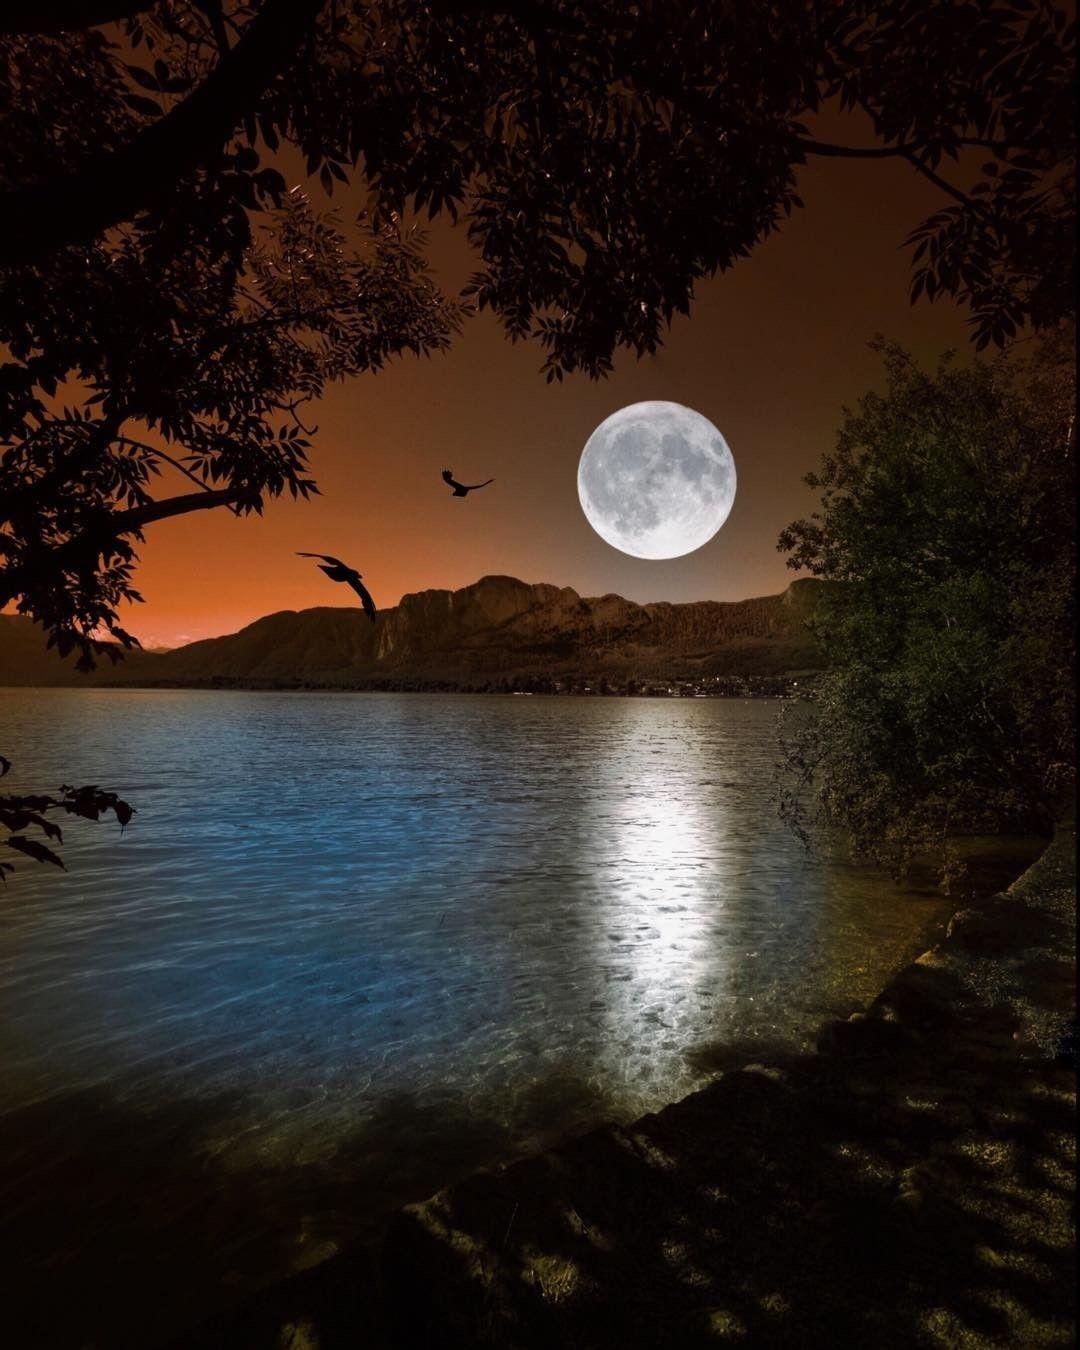 Pin By Shmyga Marina Vyacheslavovna On Luna Beautiful Moon Nature Photography Moon Photography